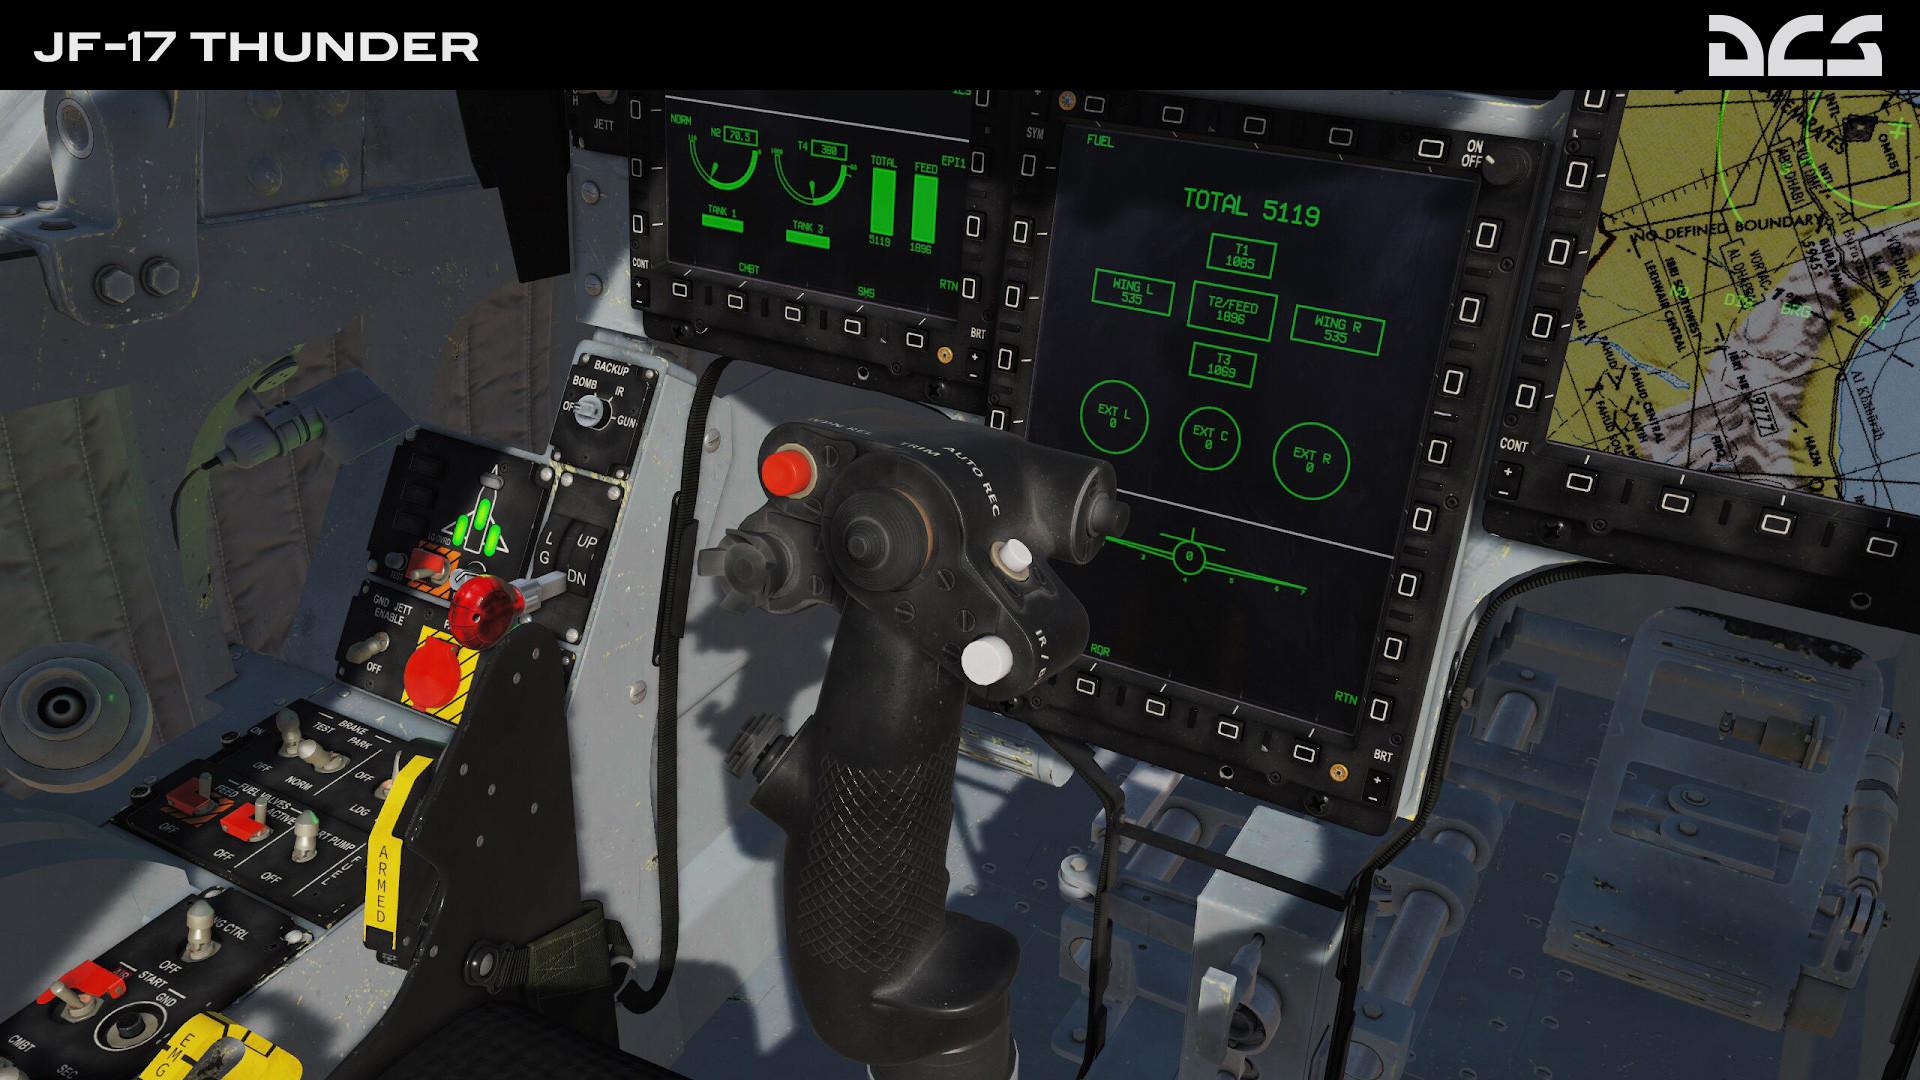 DCS: JF-17 Thunder PC Fiyatları